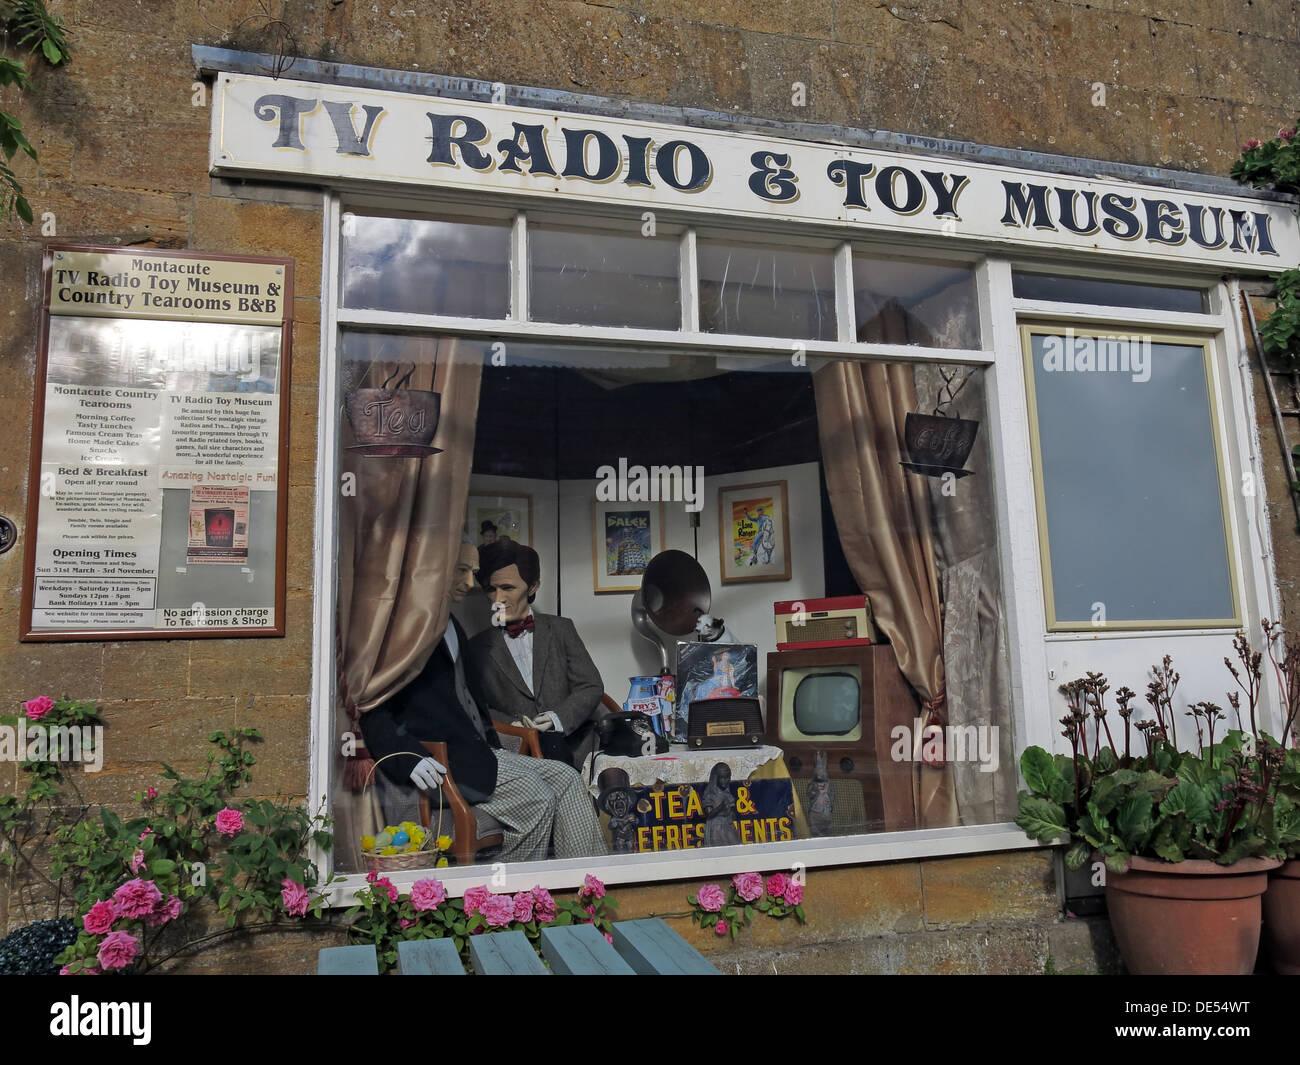 TV,Radio,&,Toy,Museum,history,historic,Montecute,Village,south Somerset,England,UK,historic,window,tourist,attraction,tea,room,coffee,shop,TA15,6XD,memorabilia,exhibits,nostalgia,nostalgic,childhood,programmes,programs,BBC,ITA,ITV,ATV,Tardis,BW,TA15 6XD,Dr Who,Black and White,GoTonySmith,@HotpixUK,Buy Pictures of,Buy Images Of,Images of,Stock Images